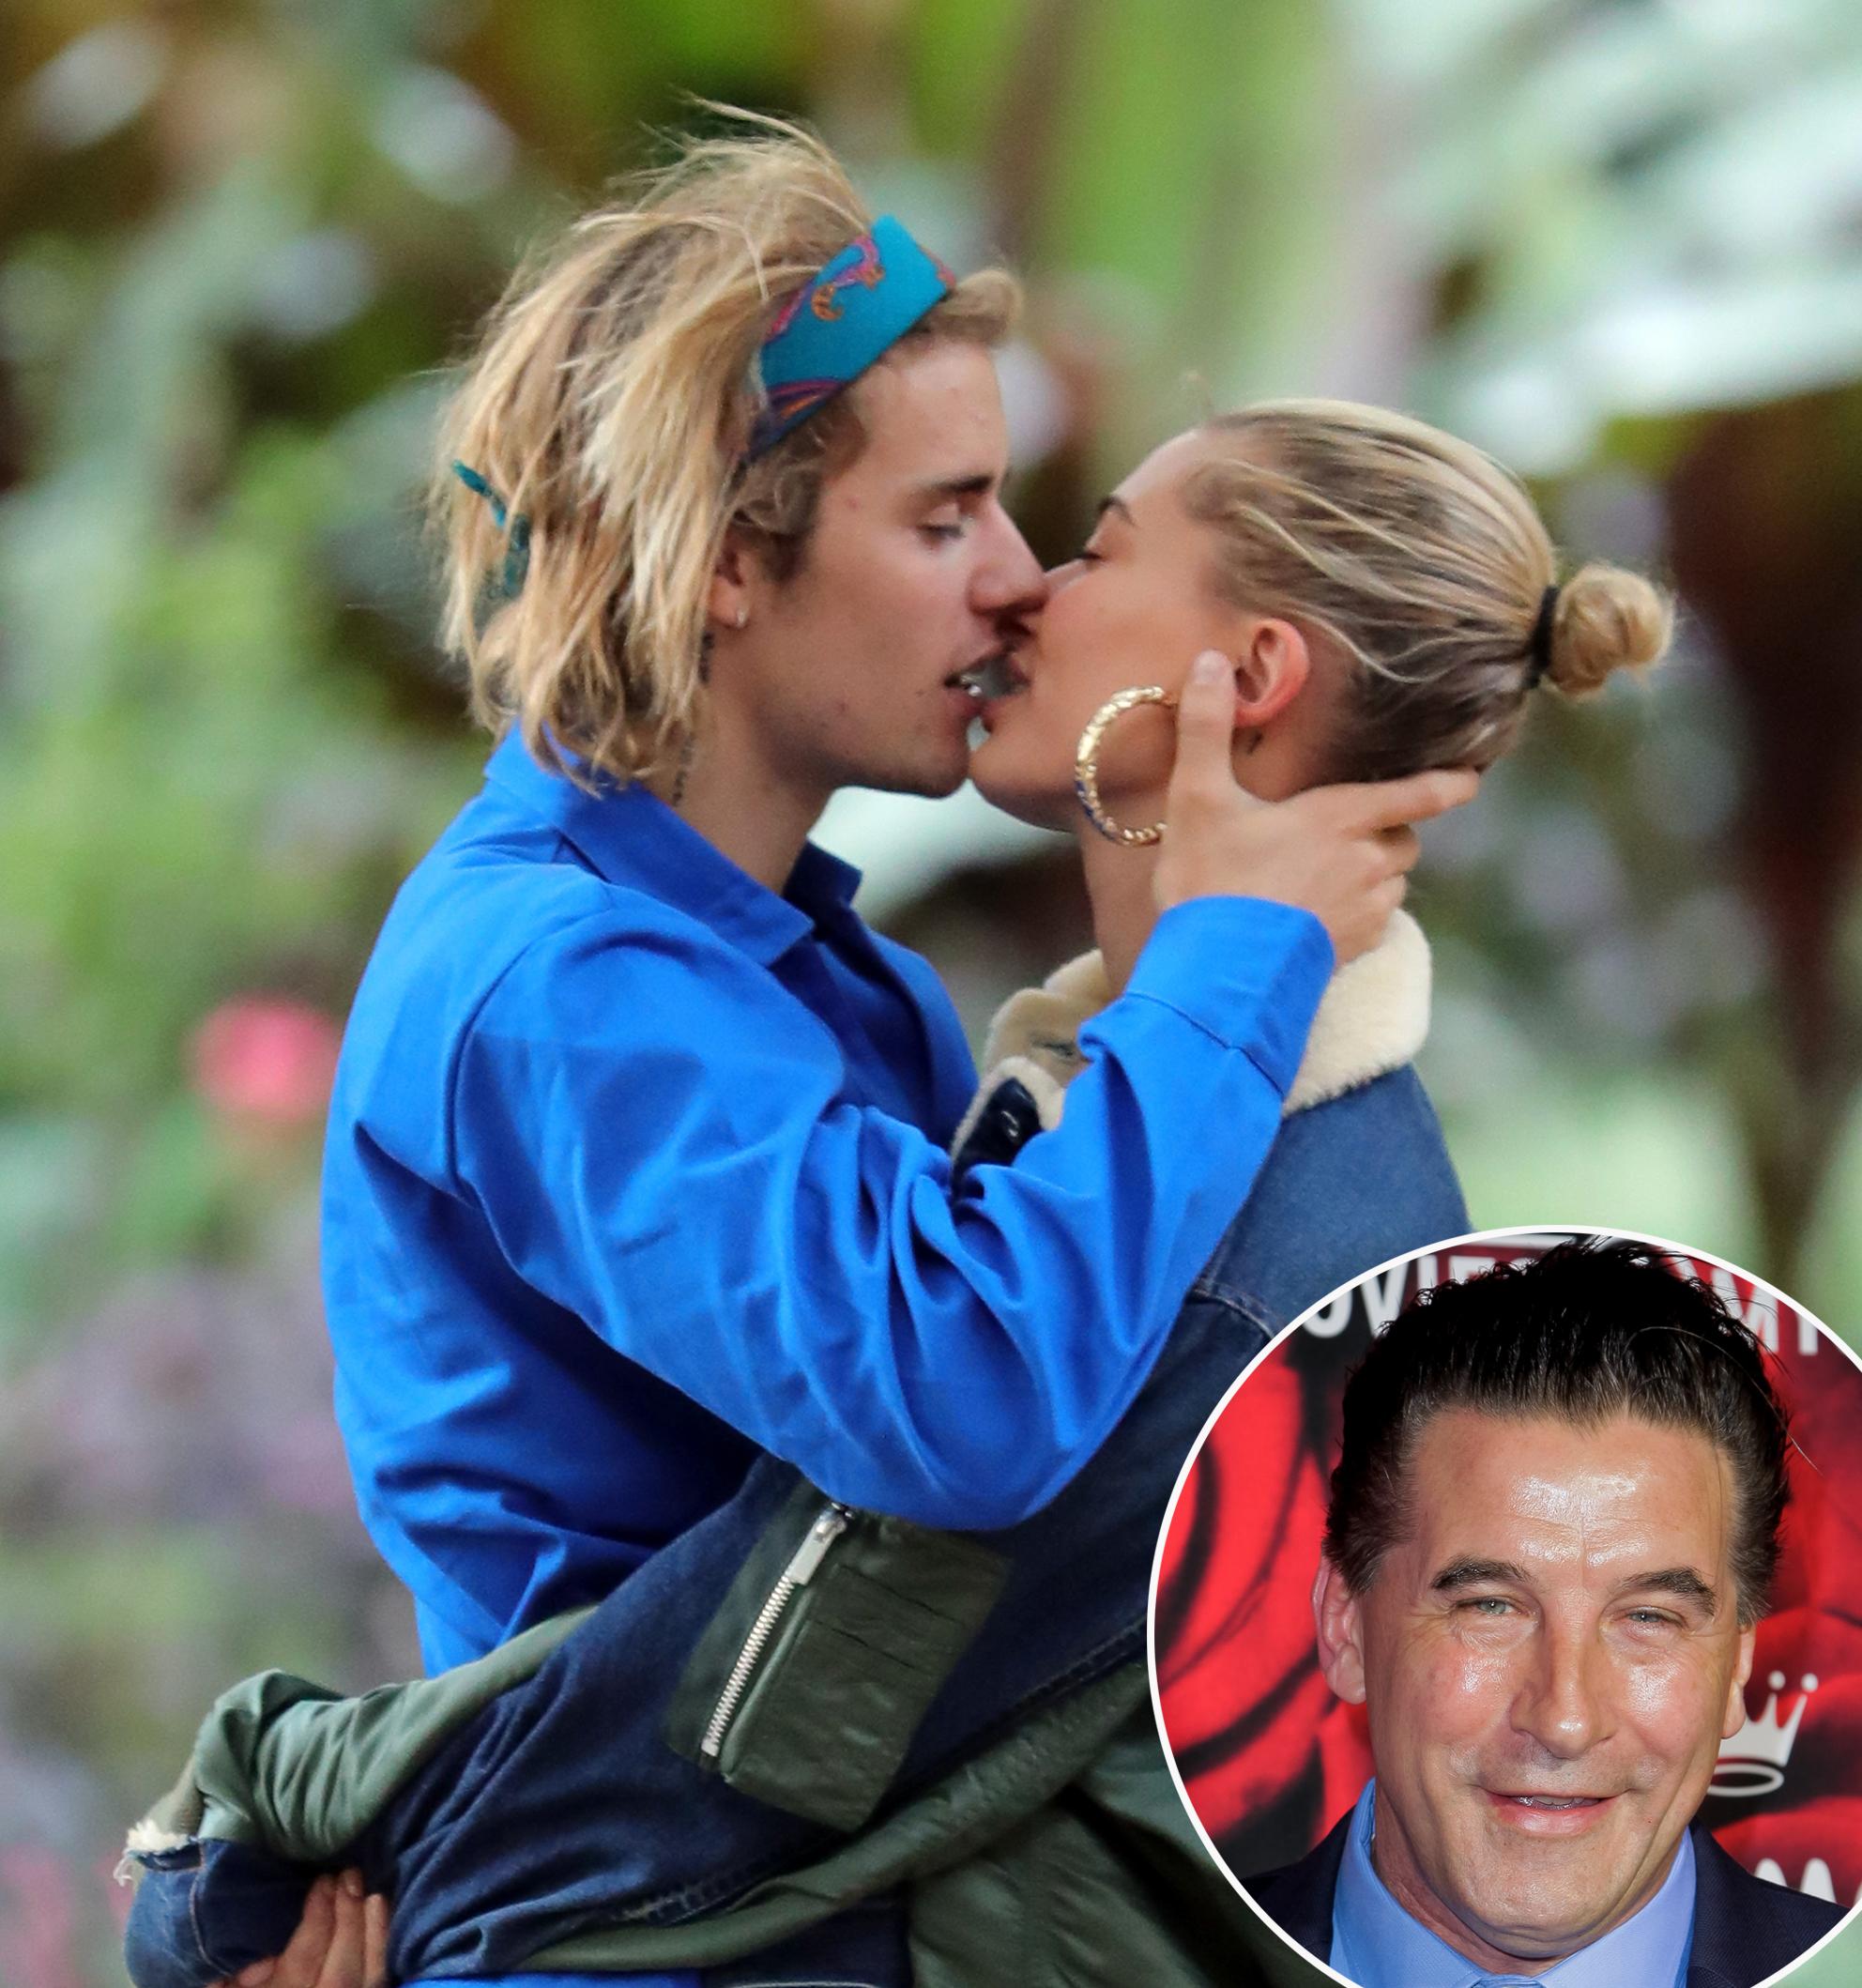 Billy Baldwin Hints the Kardashians and Gigi Hadid May Attend Justin Bieber and Hailey Baldwin's Wedding